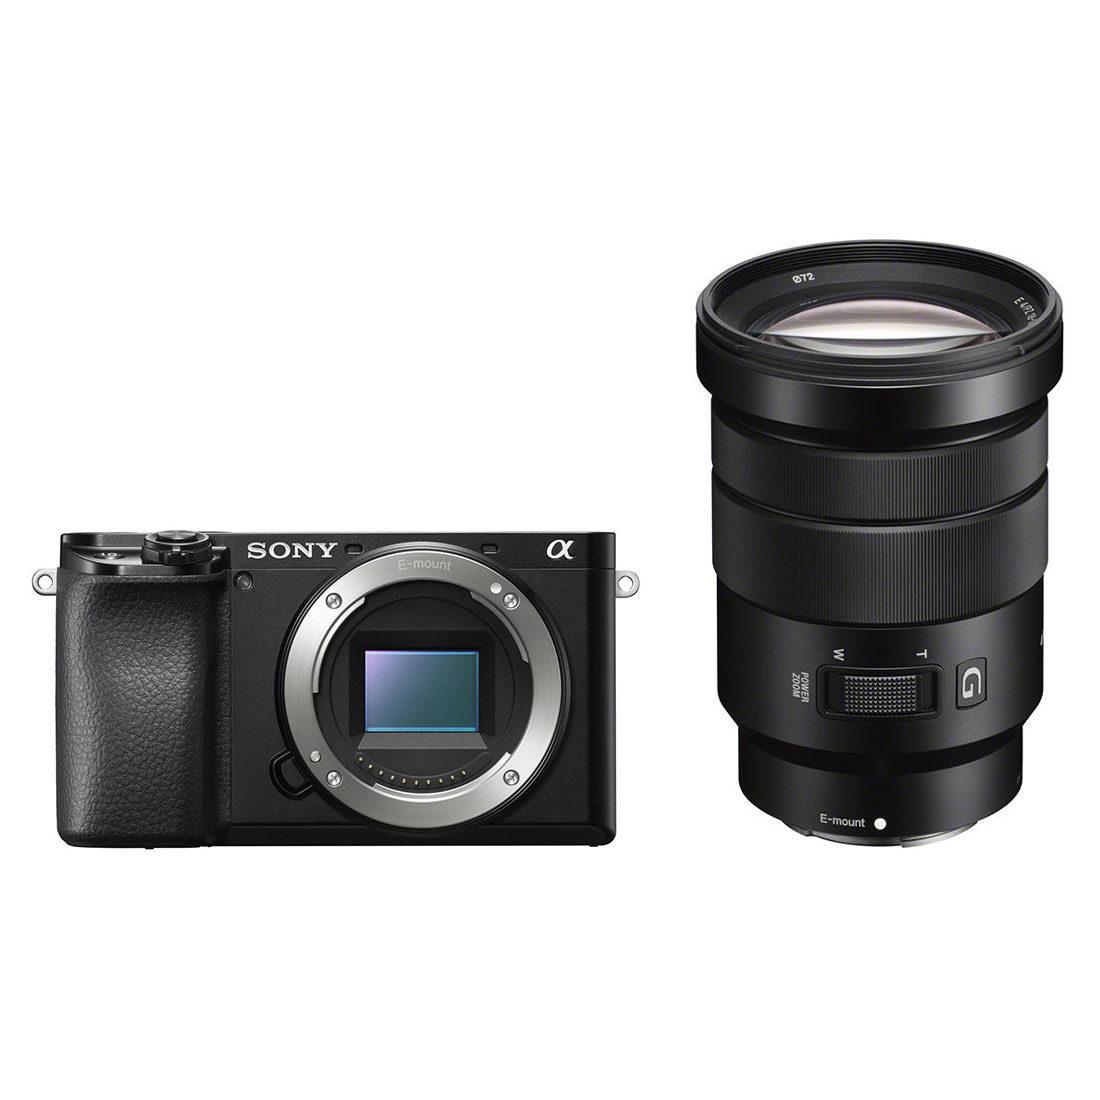 Sony Alpha A6100 systeemcamera Zwart + 18-105mm f/4.0 <br/>€ 1199.00 <br/> <a href='https://www.cameranu.nl/fotografie/?tt=12190_474631_241358_&r=https%3A%2F%2Fwww.cameranu.nl%2Fnl%2Fp3194852%2Fsony-alpha-a6100-systeemcamera-zwart-18-105mm-f-4-0%3Fchannable%3D002a596964003331393438353237%26utm_campaign%3D%26utm_content%3DSony%2Bsysteemcamera%26utm_source%3DTradetracker%26utm_medium%3Dcpc%26utm_term%3DDigitale%2Bcamera%26apos%3Bs' target='_blank'>naar de winkel</a>